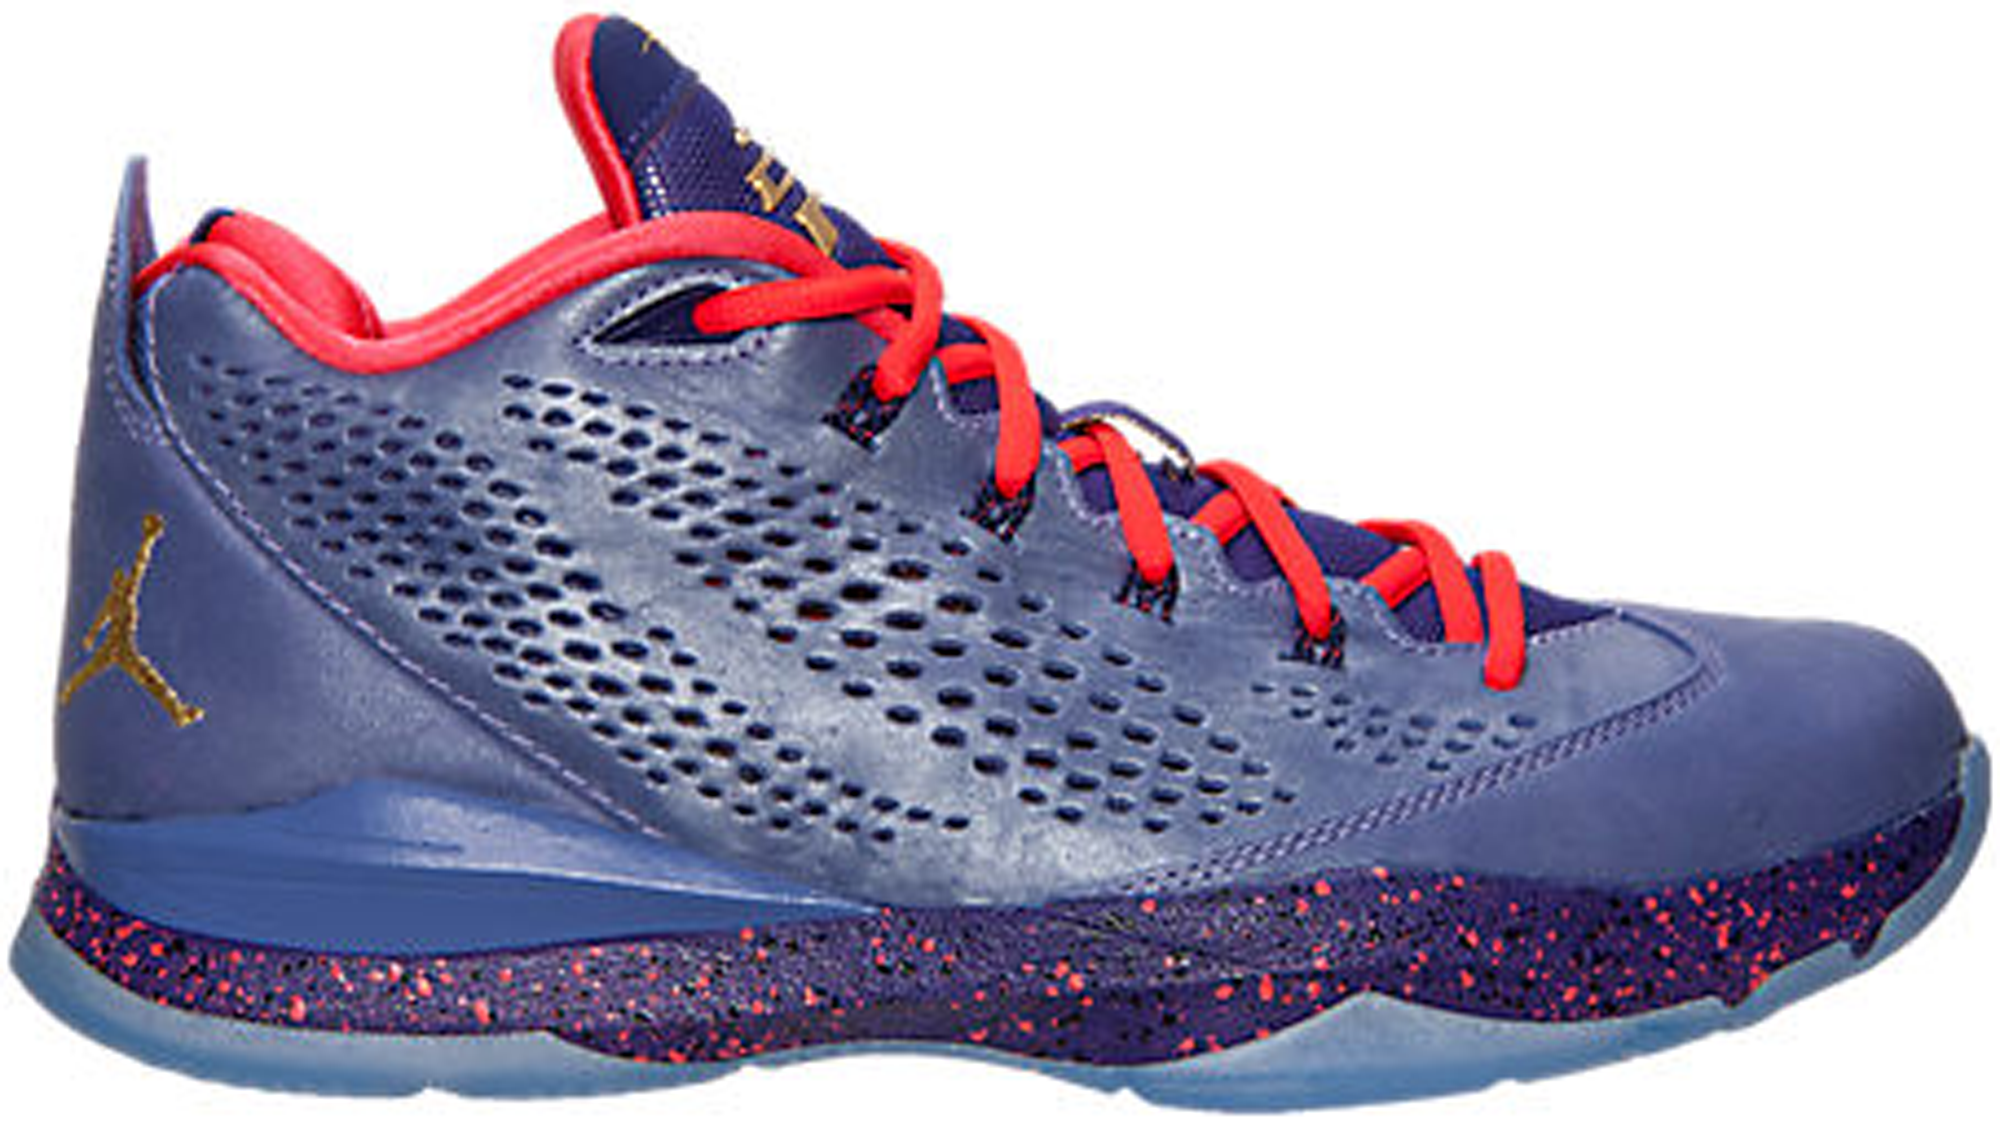 Jordan CP3.VII All-Star (2014) - 648598-523